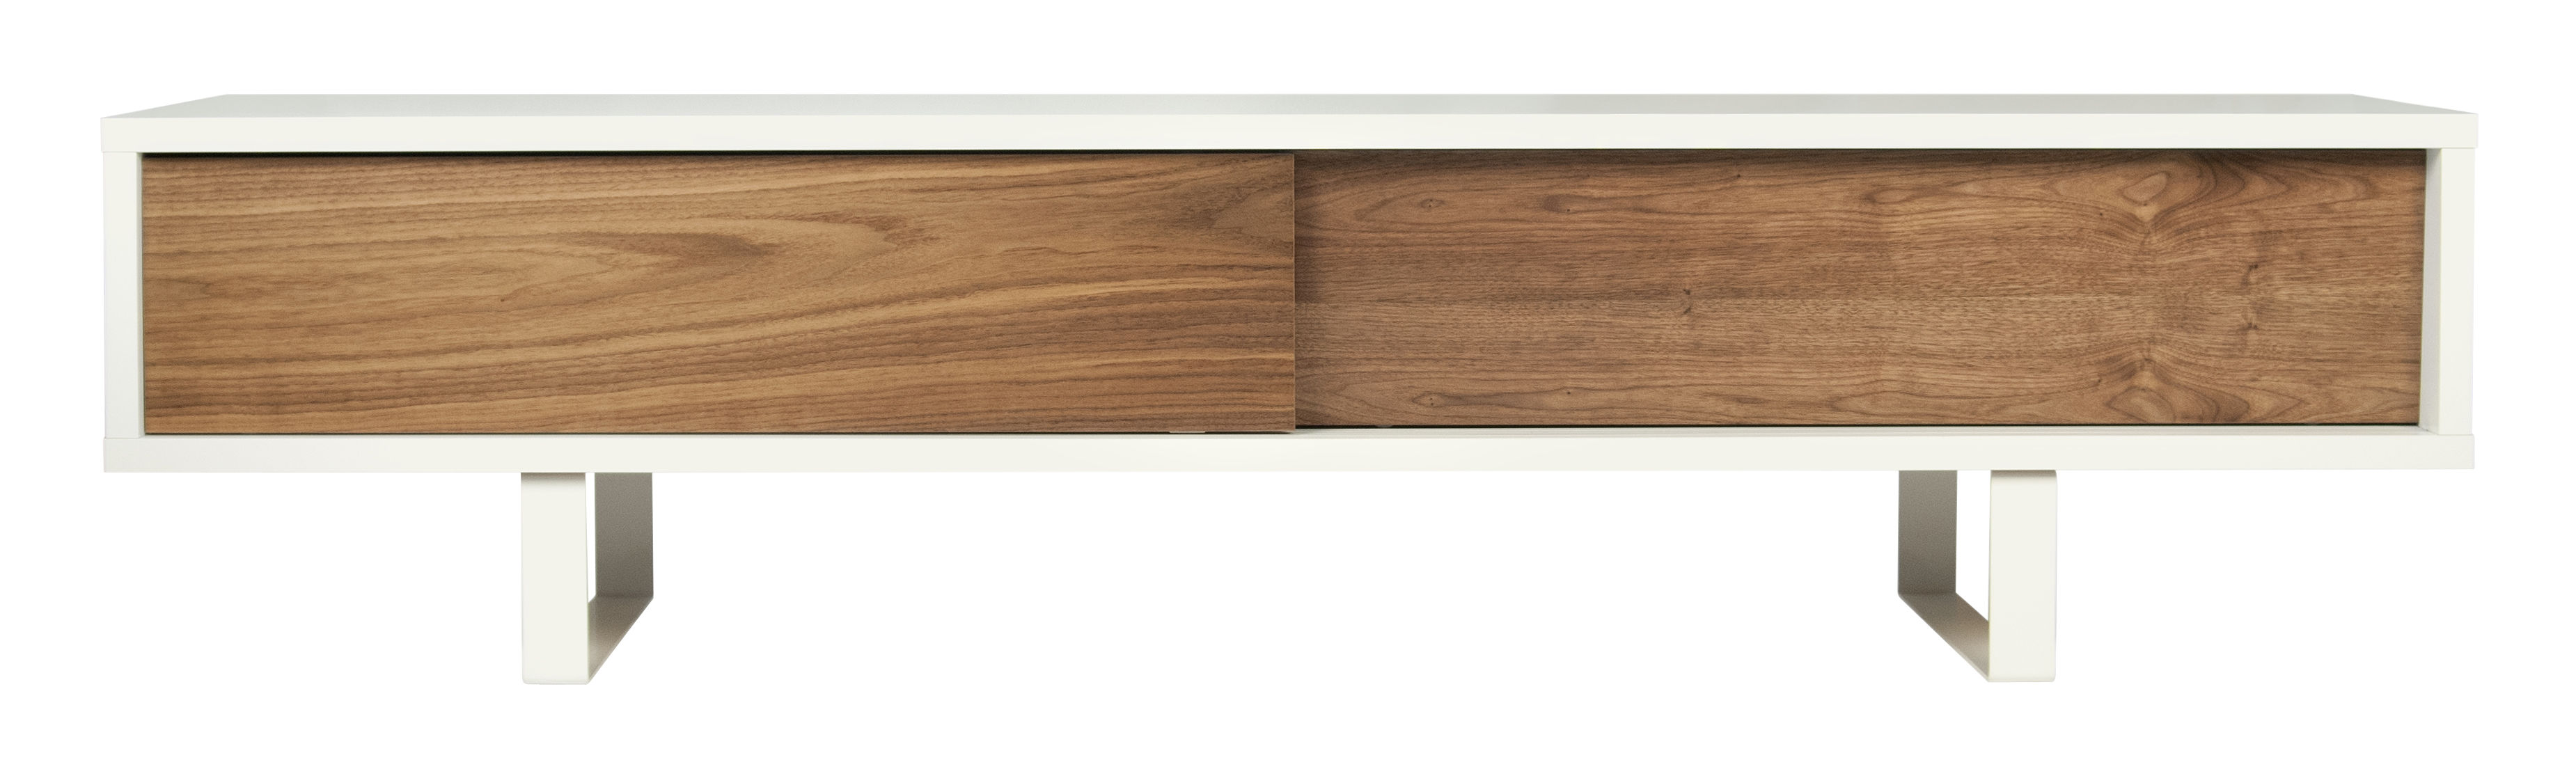 Meuble Tv Bridge Pop Up Home Blanc Noyer L 198 X H 48 Made